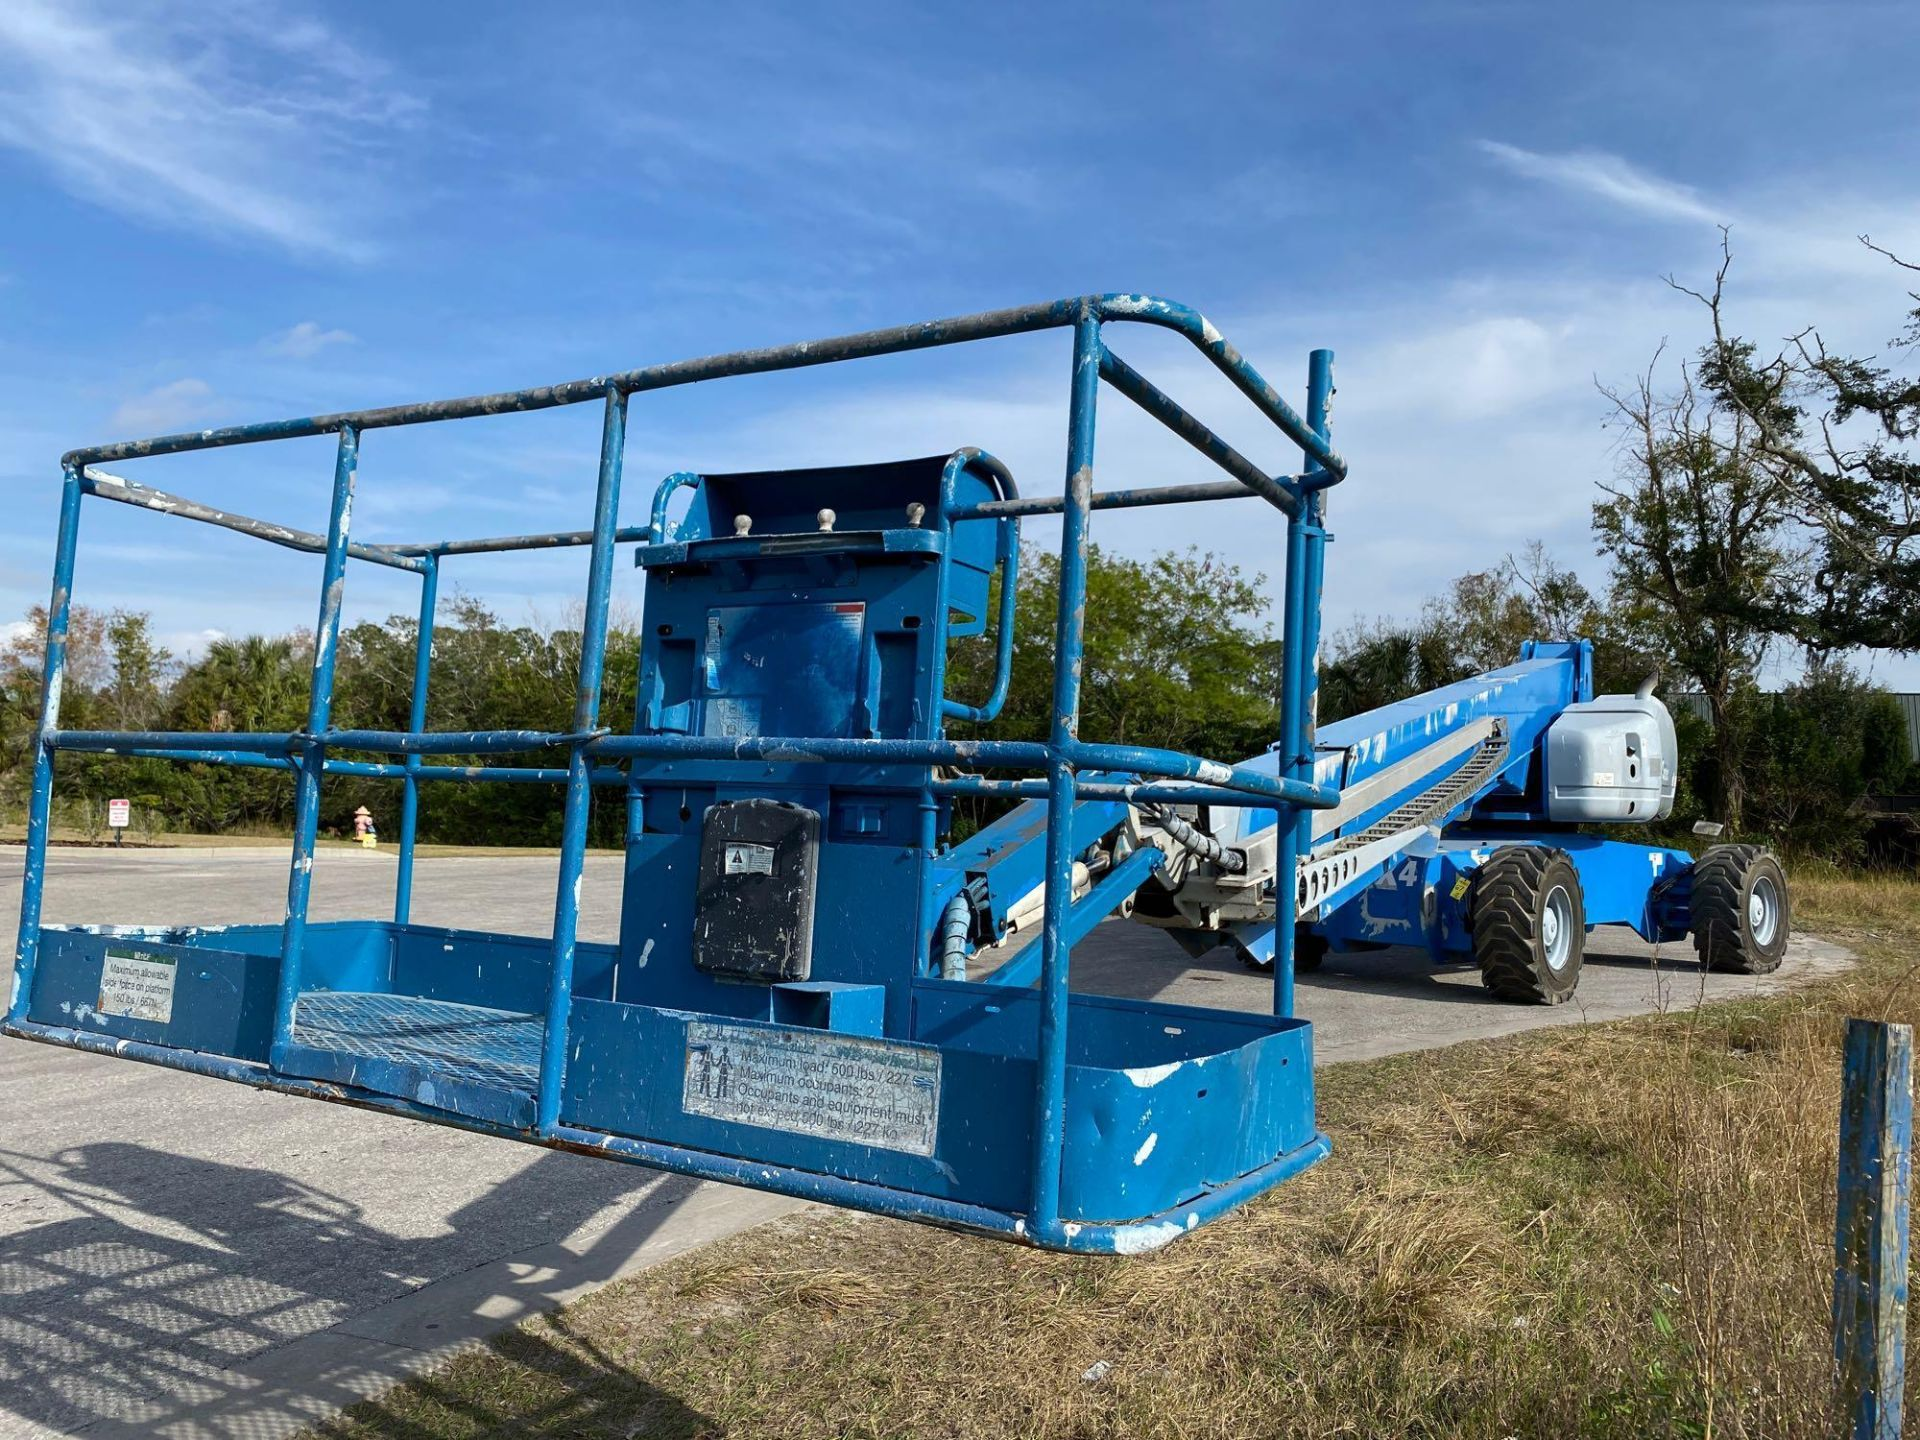 Lot 67 - GENIE S125 BOOM LIFT 4x4, POWERED BY PERKINS DIESEL ENGINE, 125FL PLATFORM HEIGHT, RUNS AND OPERATES